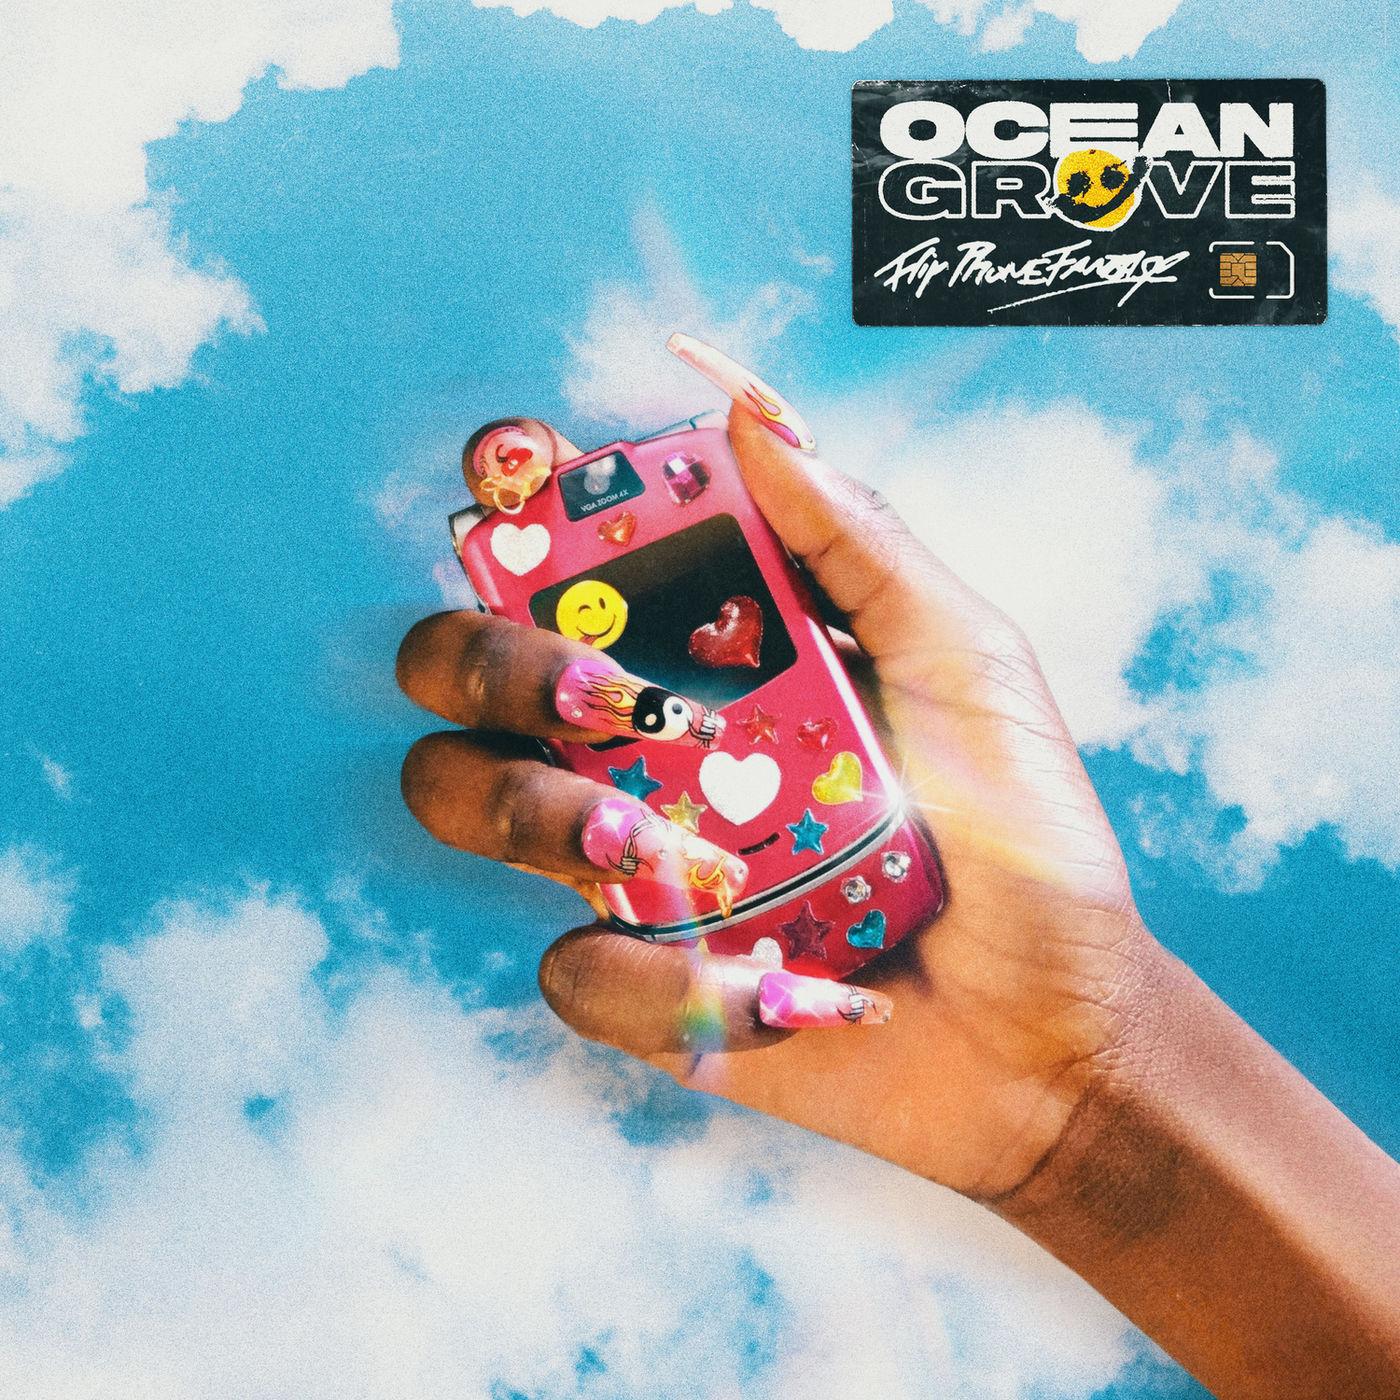 Ocean Grove - THOUSAND GOLDEN PEOPLE [single] (2020)